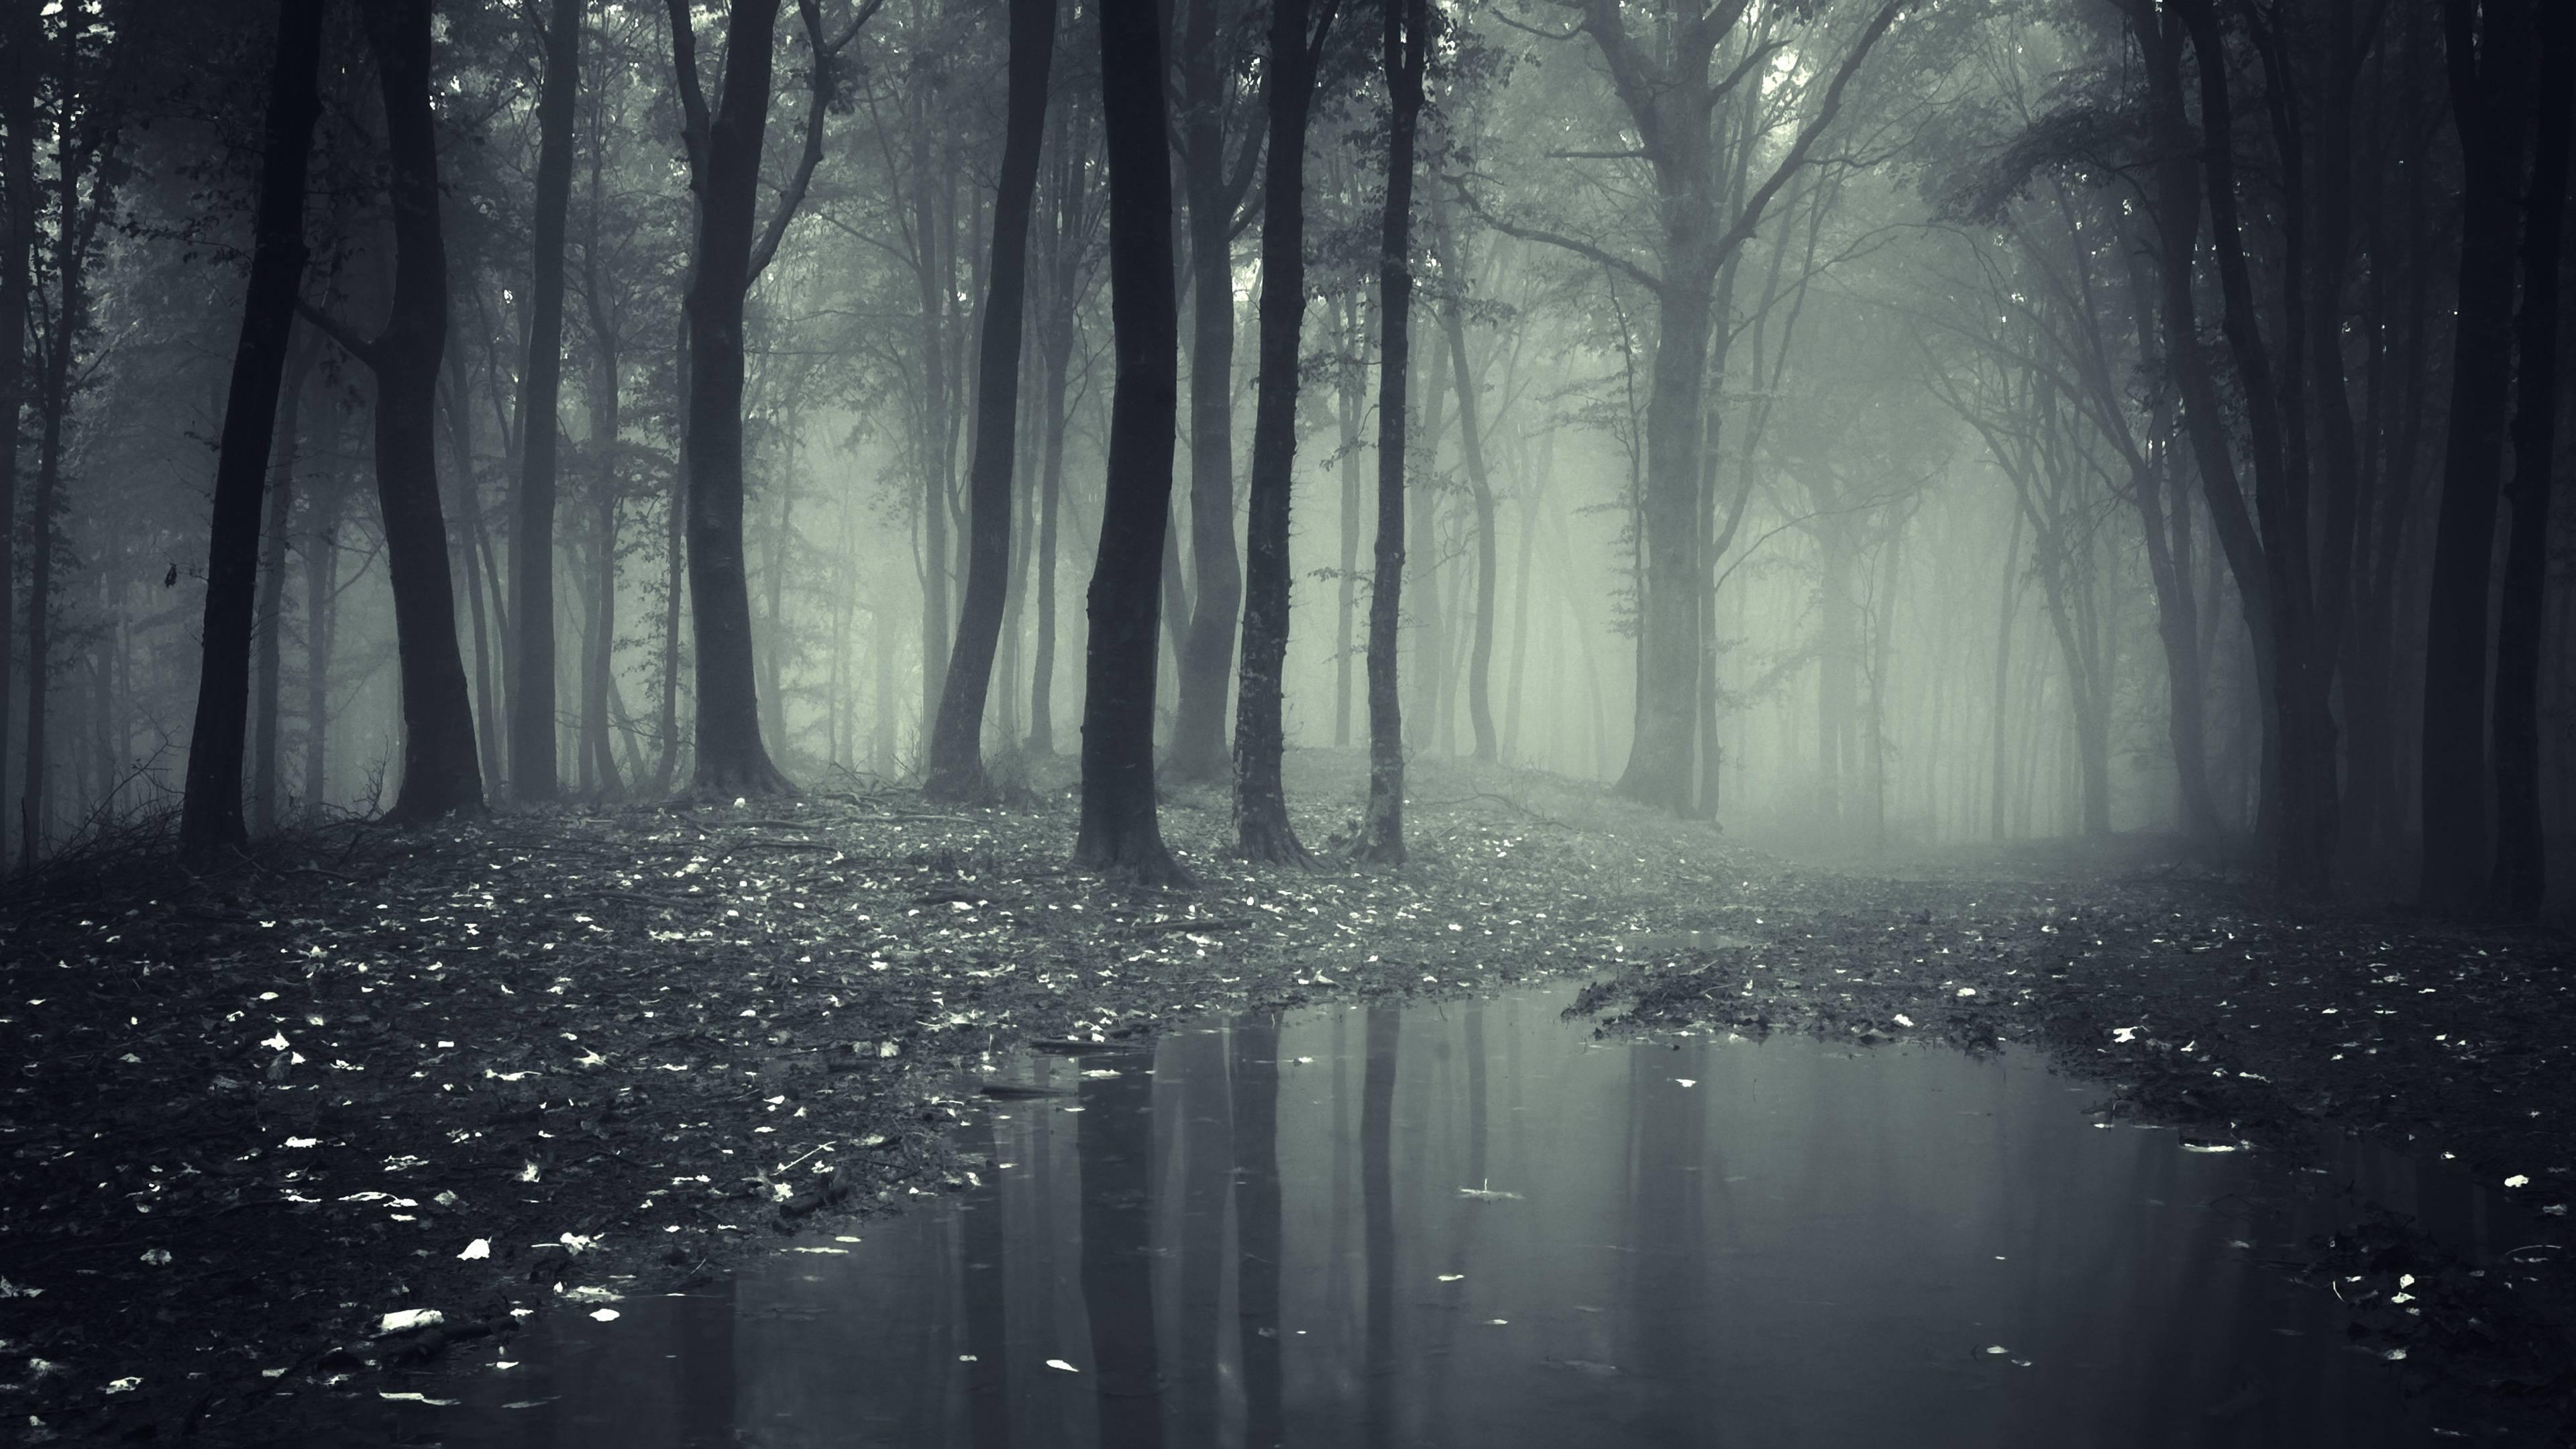 Dark Forest Backgrounds - Wallpaper Cave